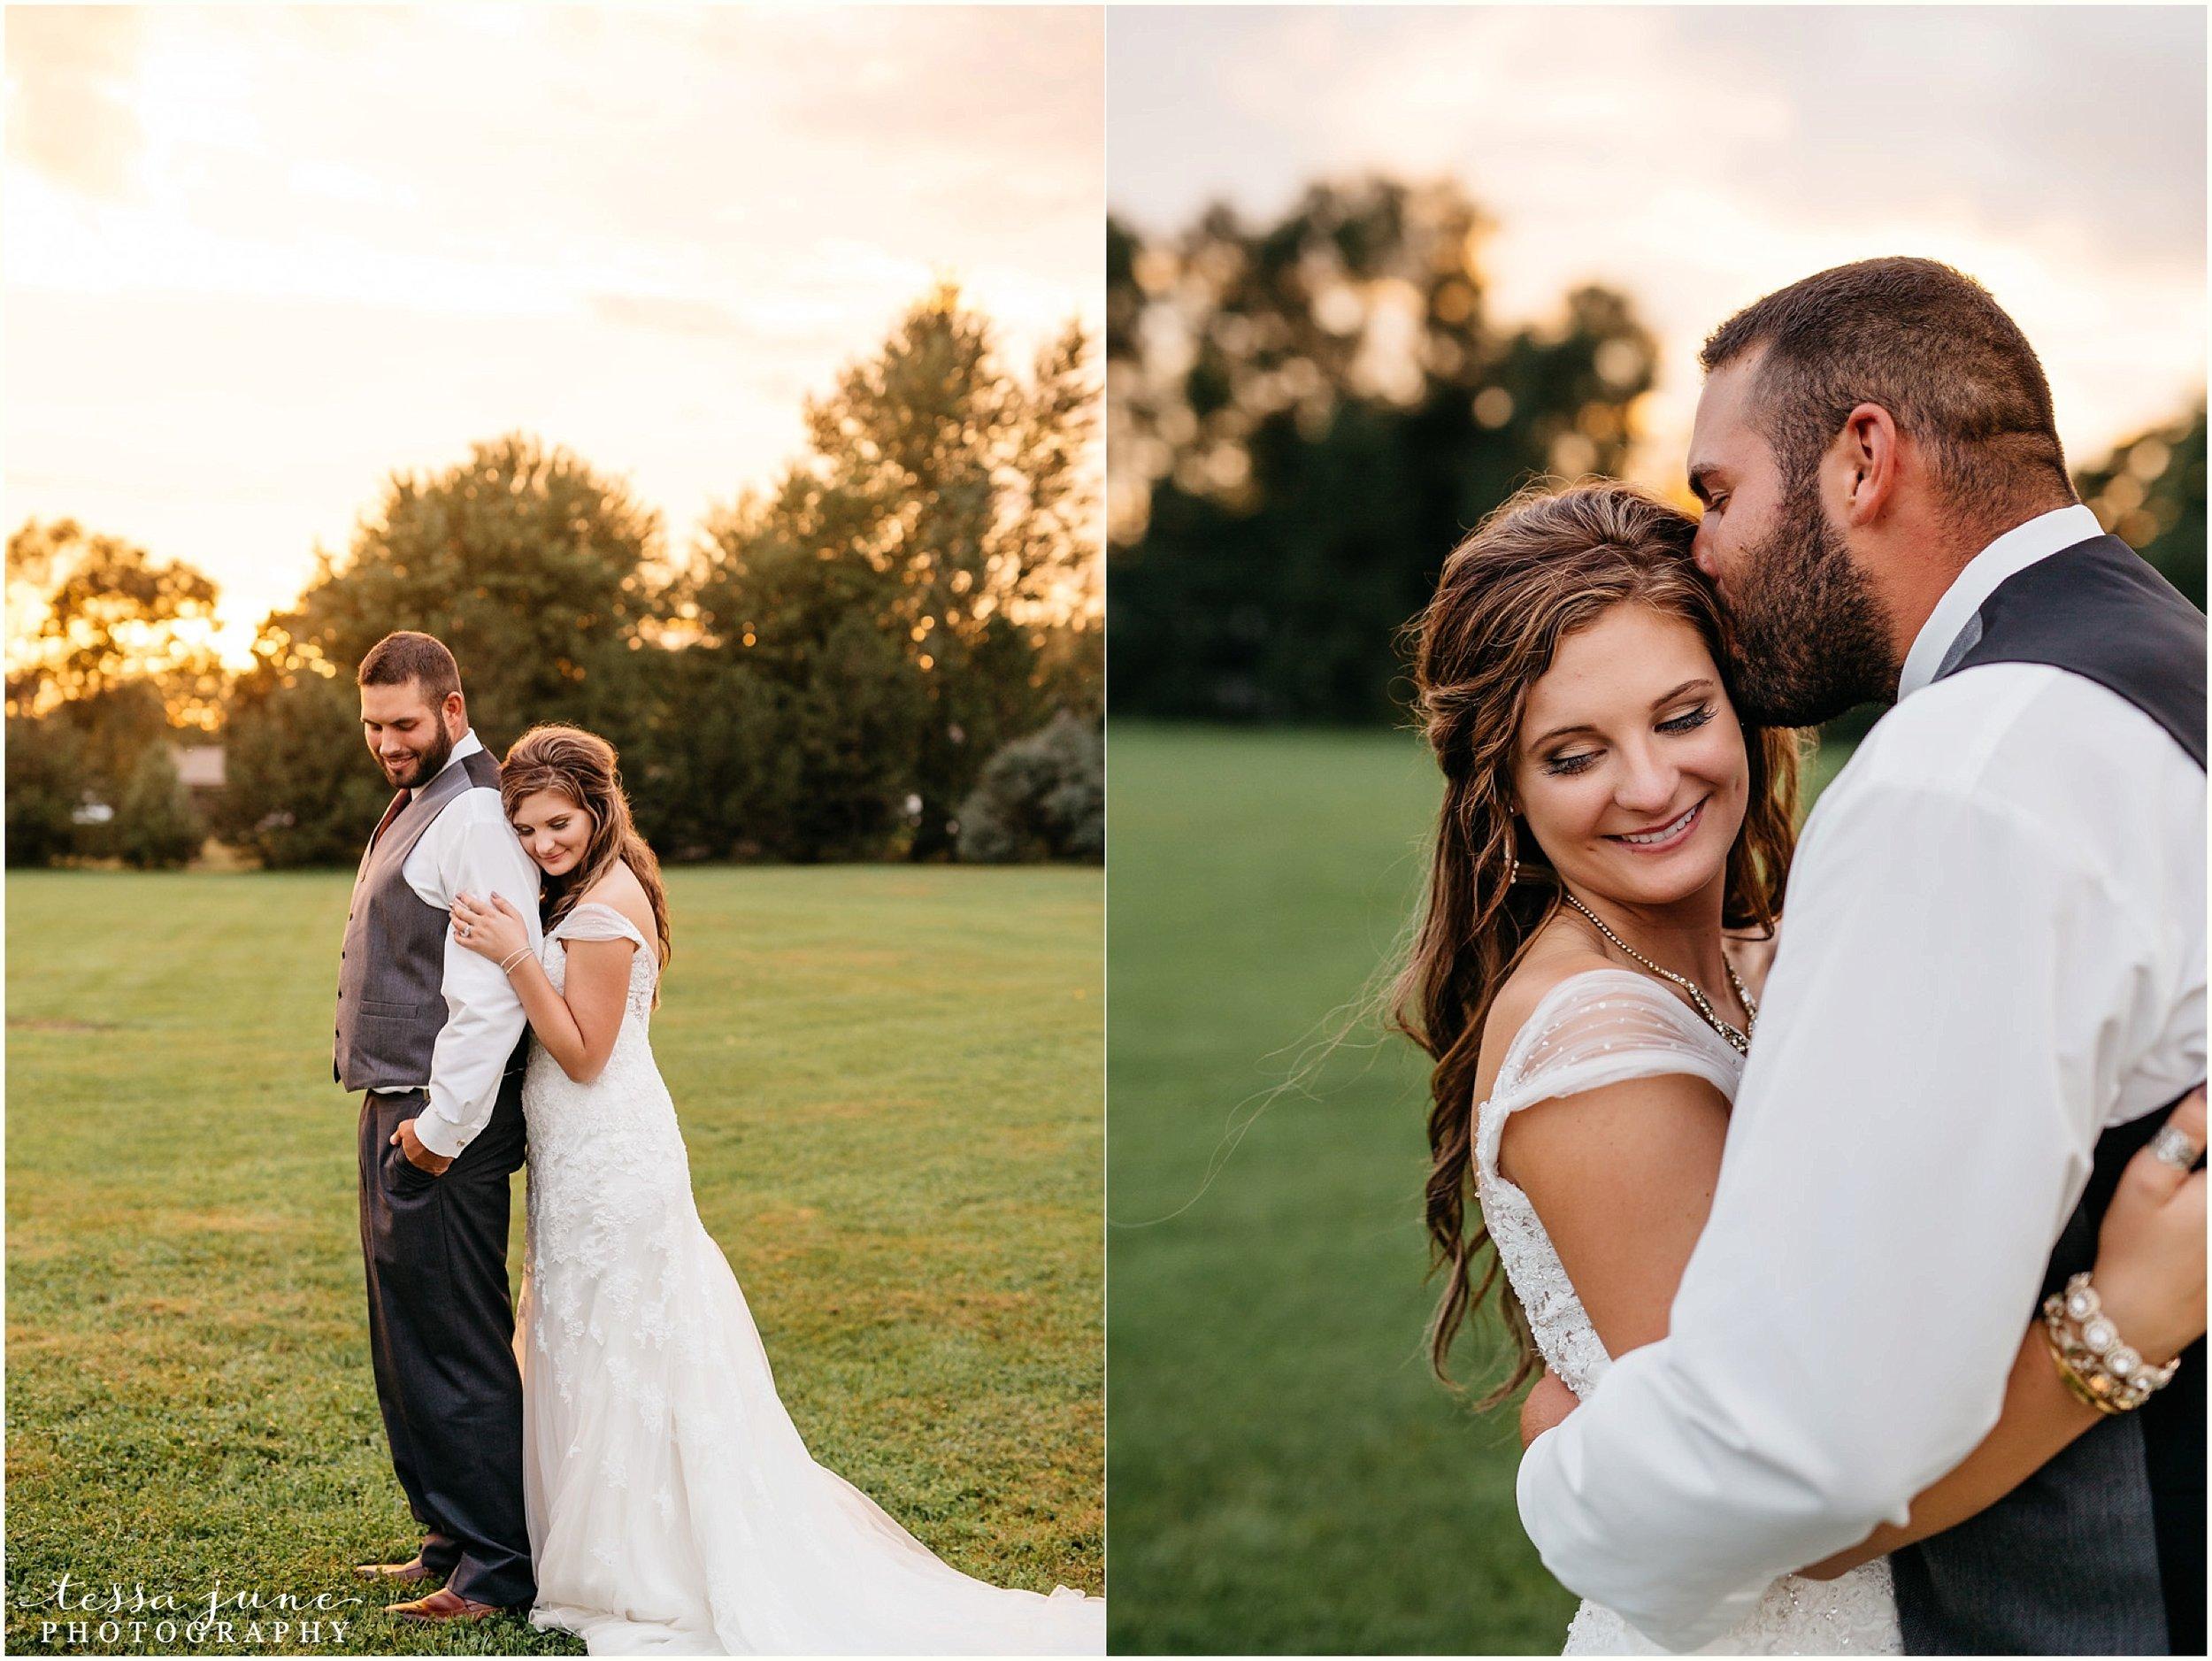 bohemian-minnesota-wedding-mismatched-bridesmaid-dresses-waterfall-st-cloud-tessa-june-photography-187.jpg